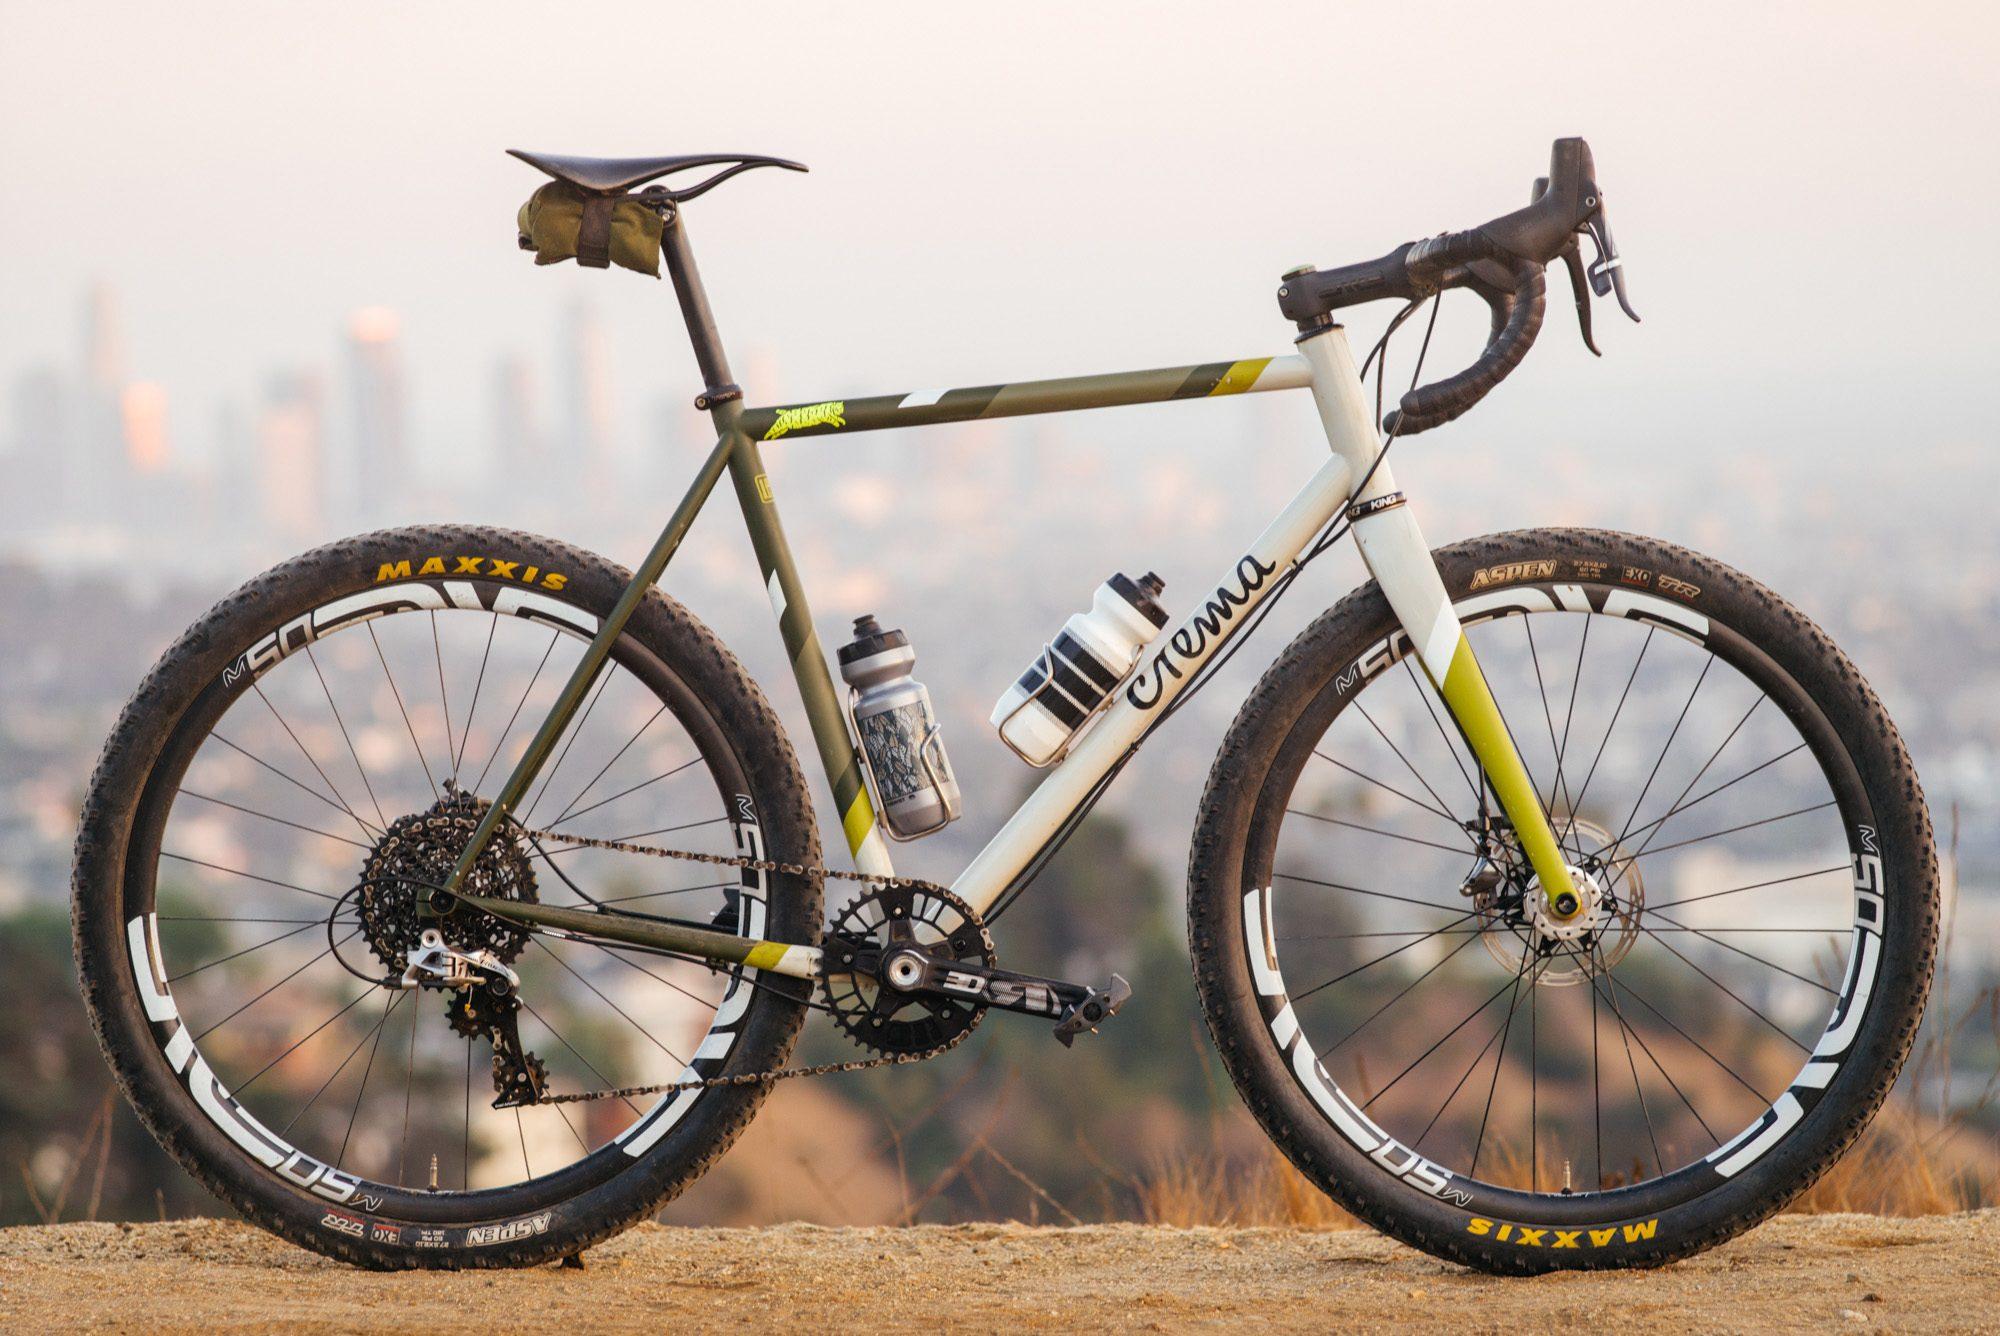 07-My-Agave-Marginata-Crema-Duo-Cross-Bike-16